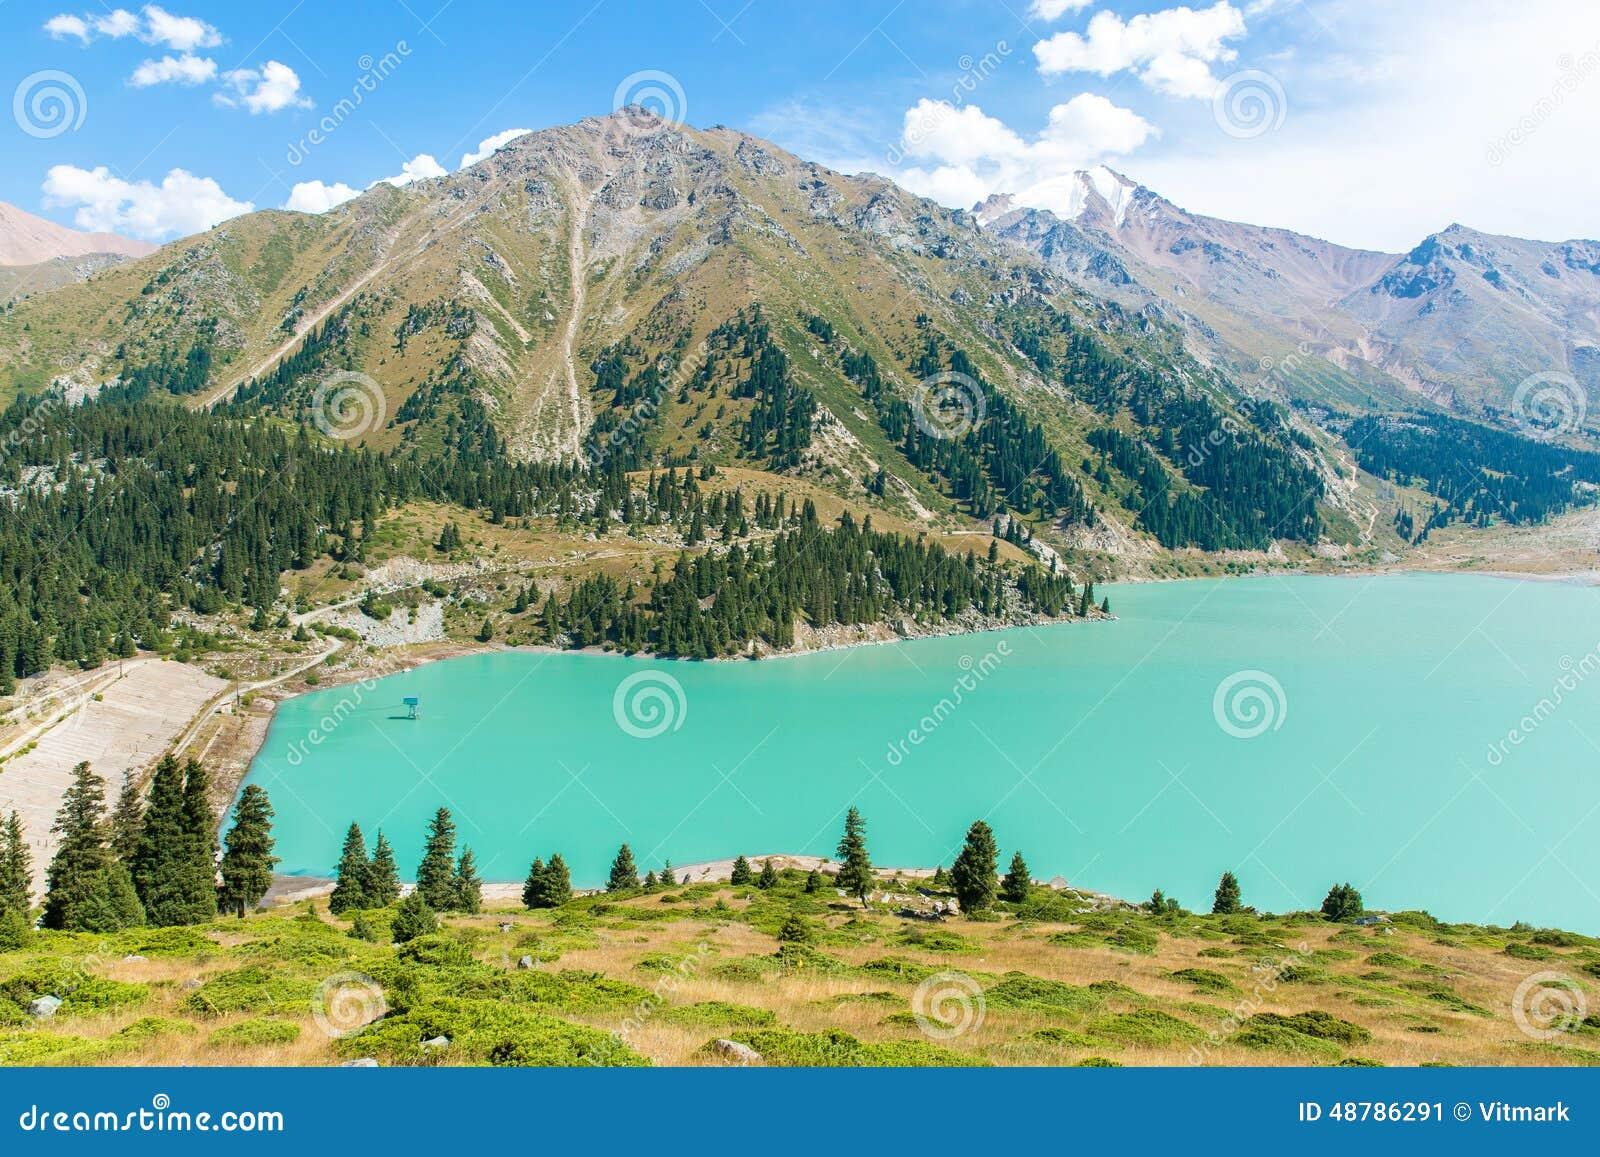 Spectacular Scenic Big Almaty Lake , Mountains In Almaty ... - photo#43